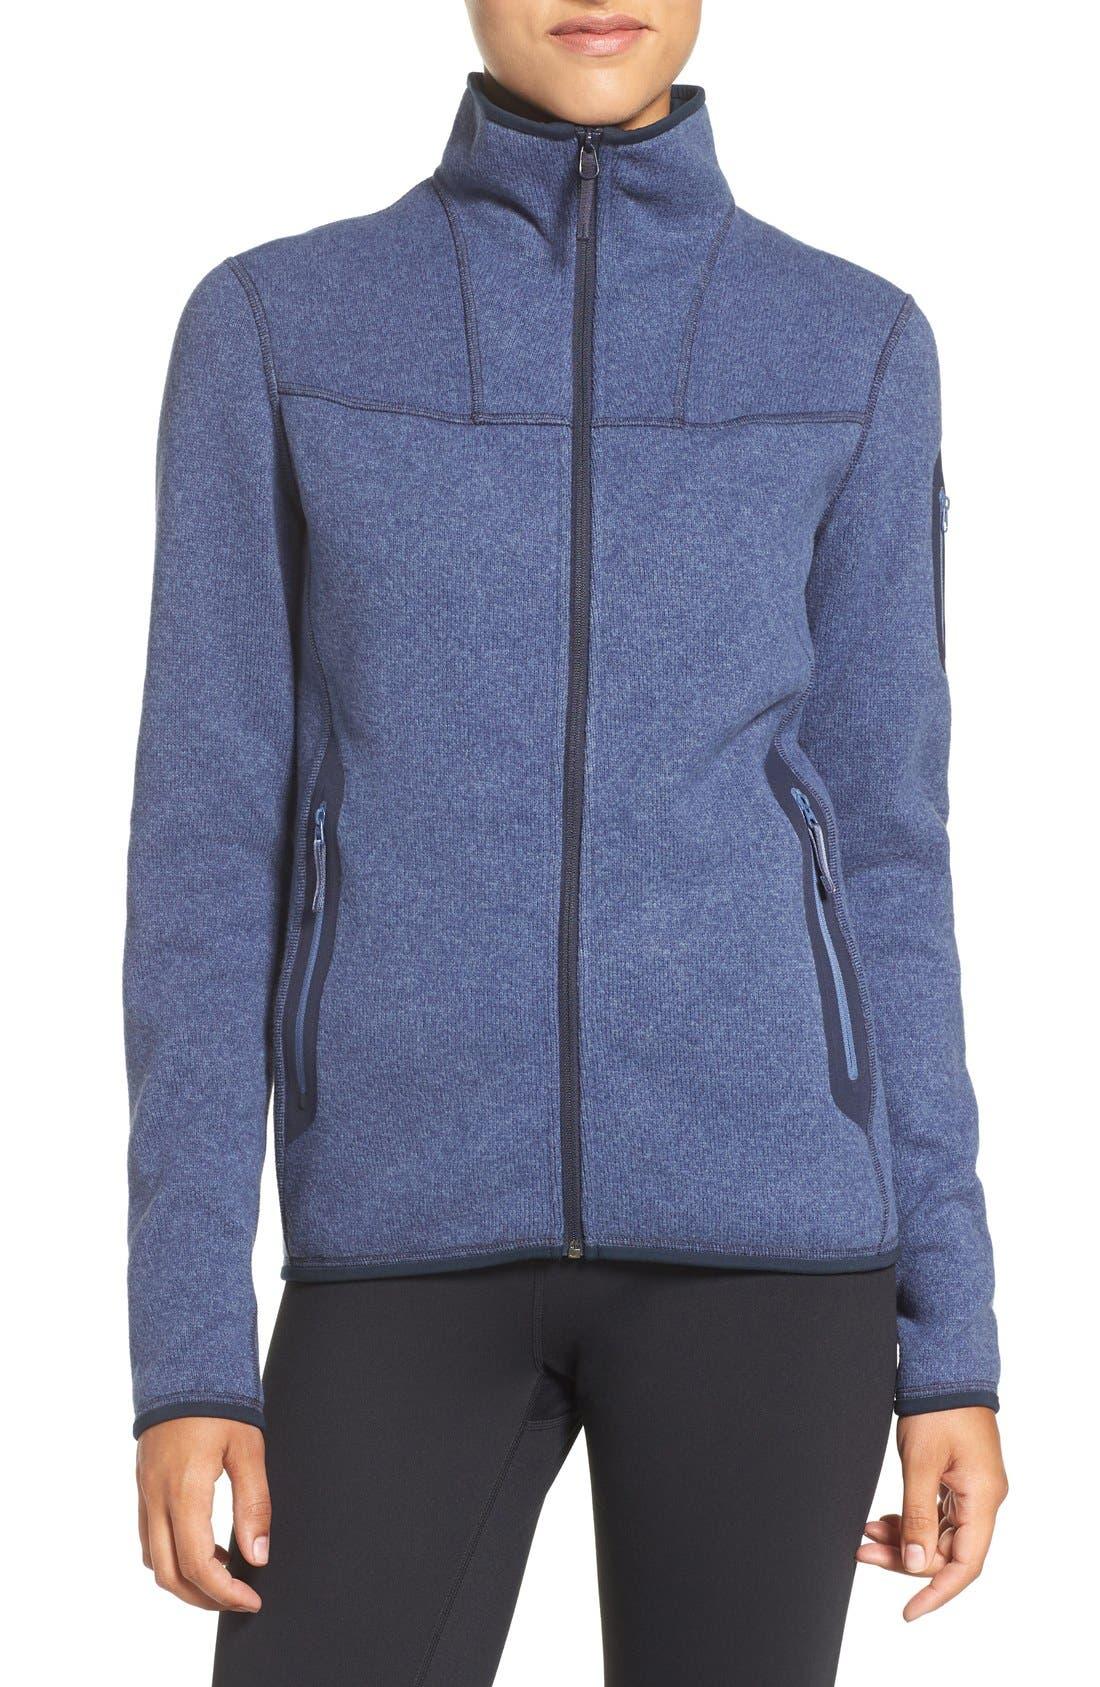 Arc'teryx Covert Cardigan Fleece Jacket